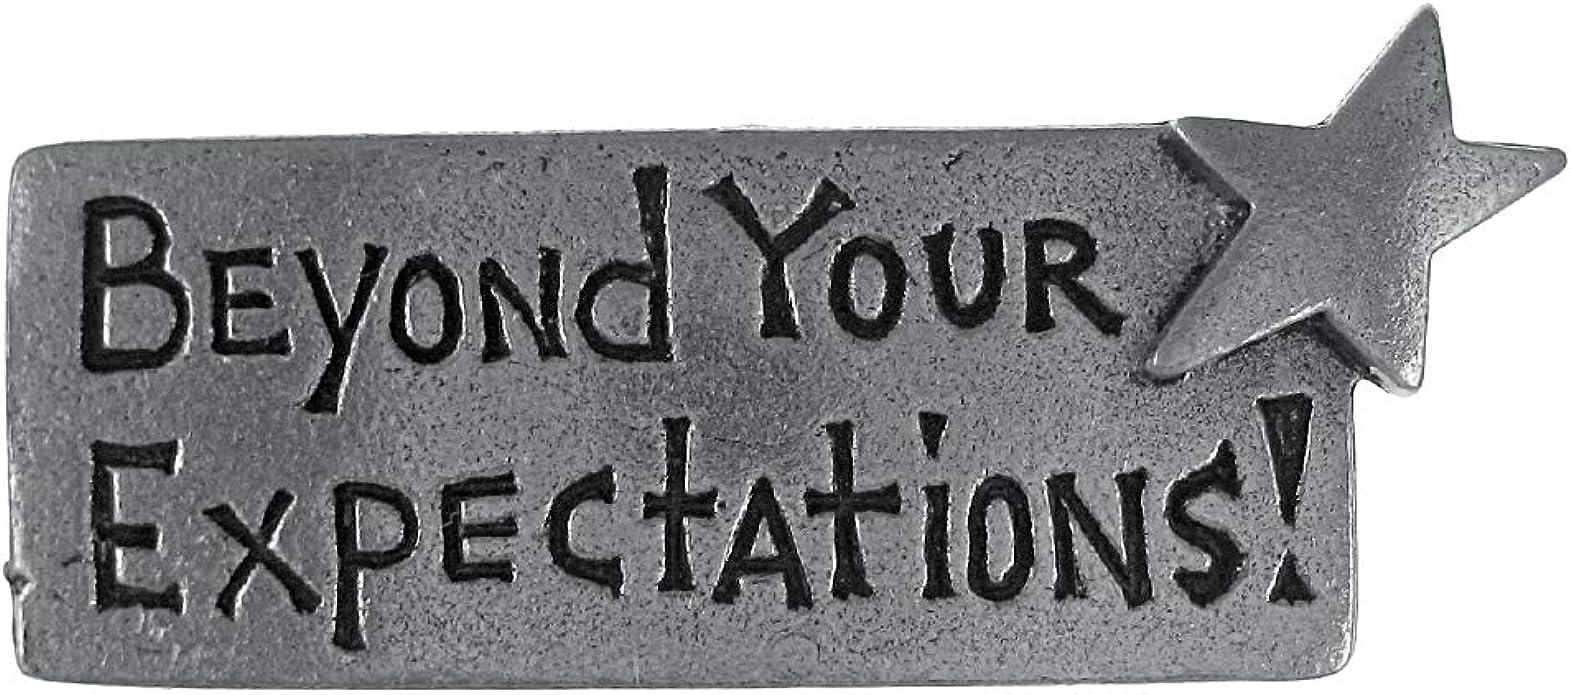 Amazon.com: Jim Clift Design Beyond Your Expectations Lapel Pin ...